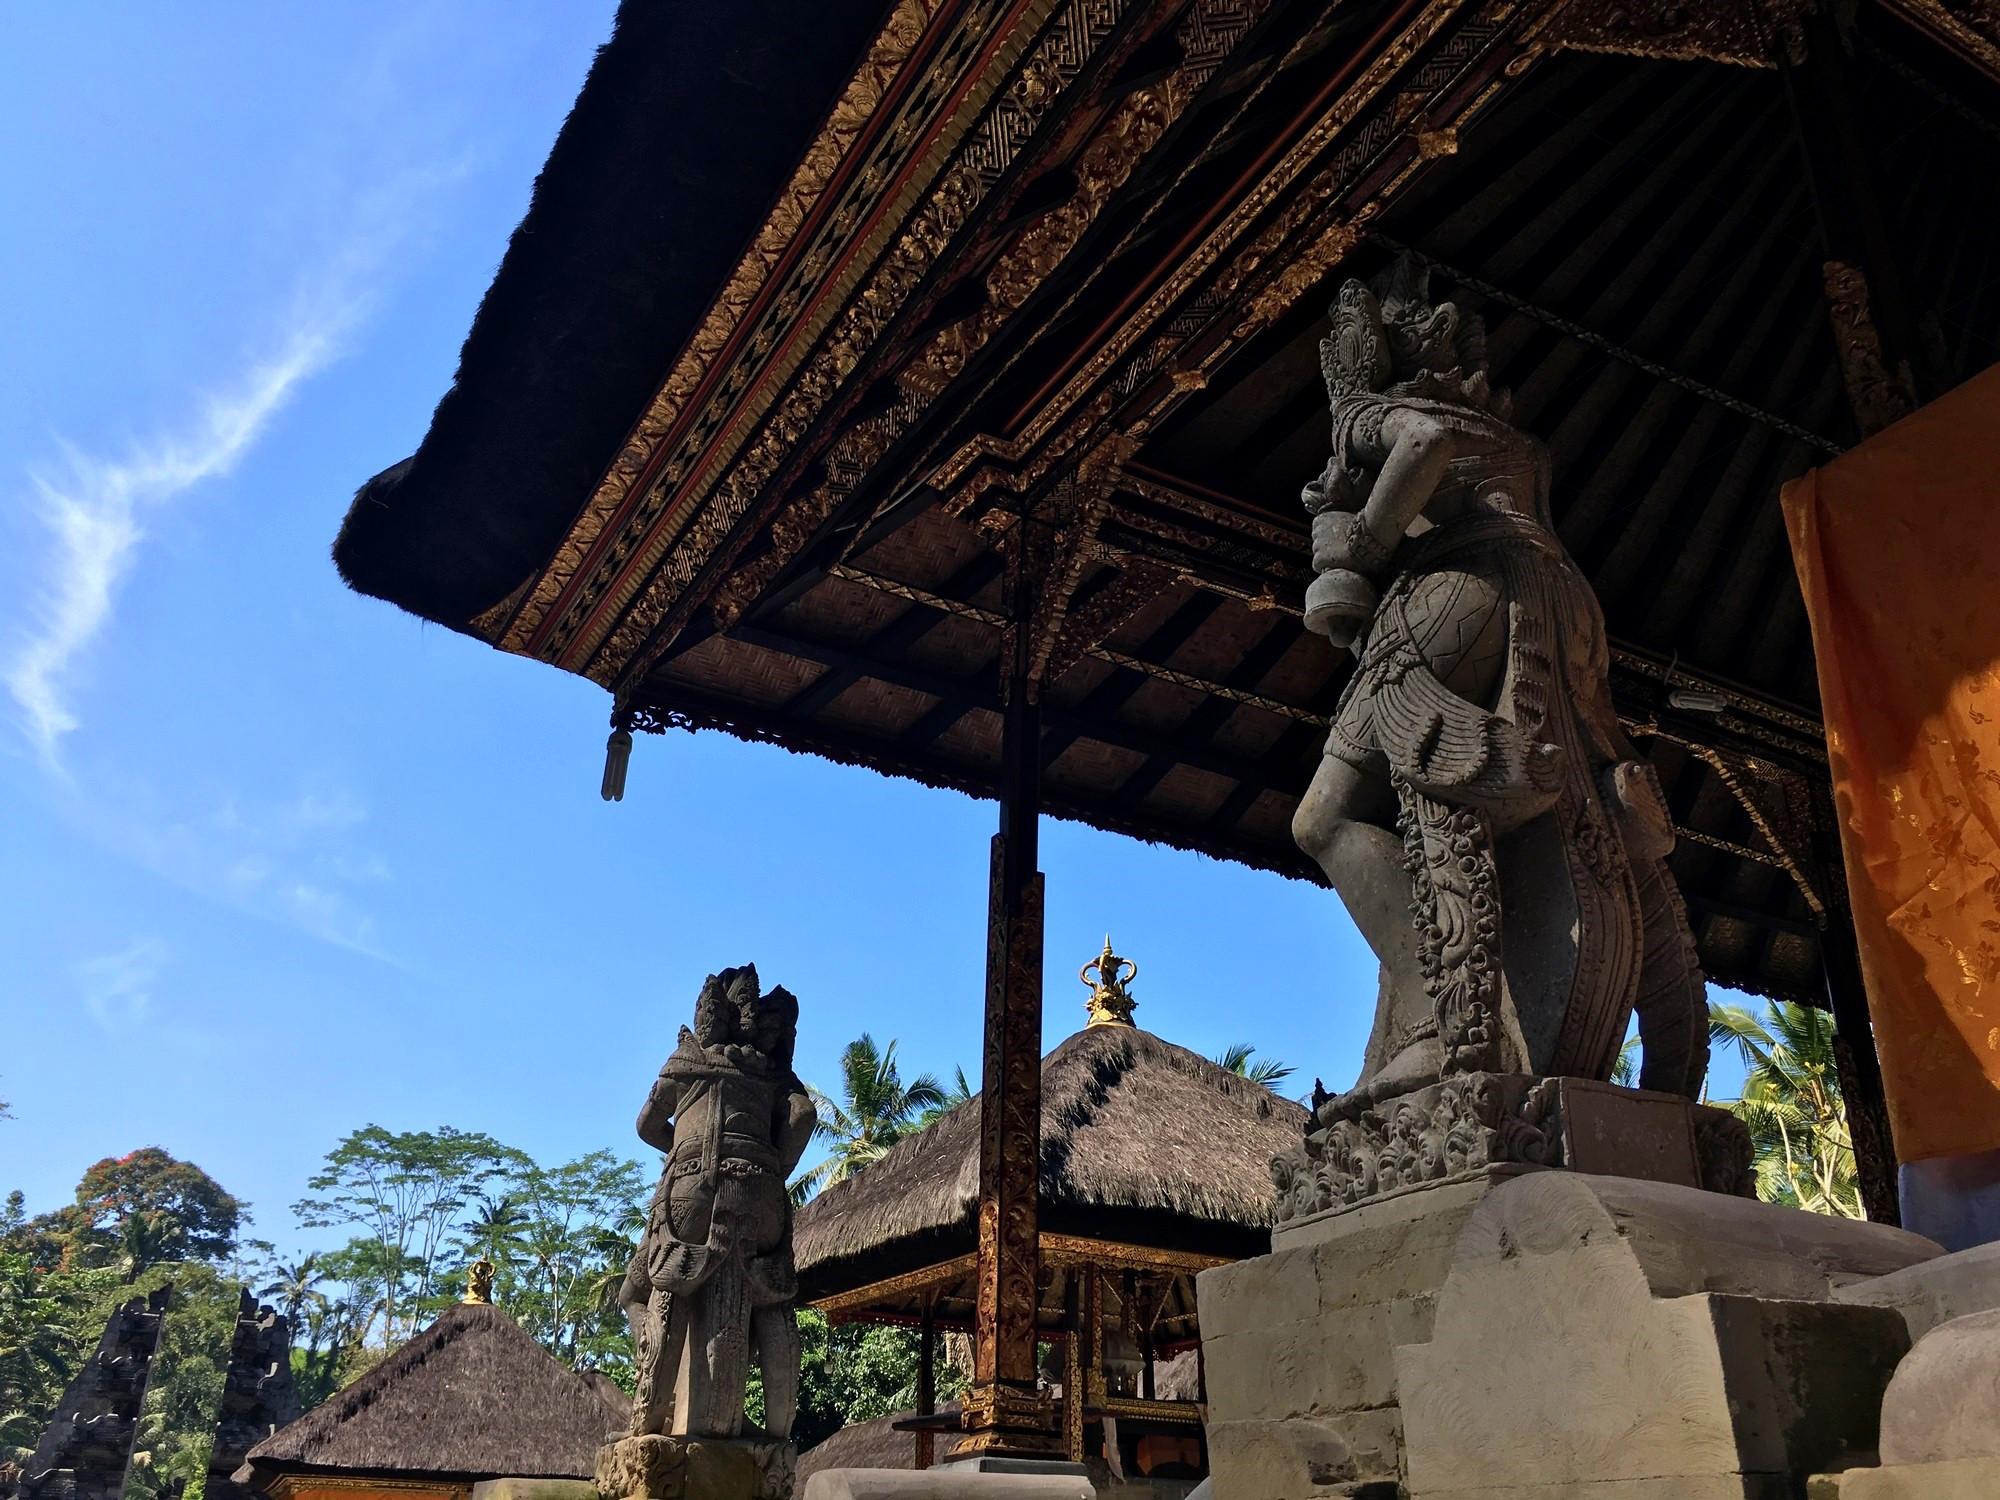 pura-gunung-kawi-bali-temple-statues